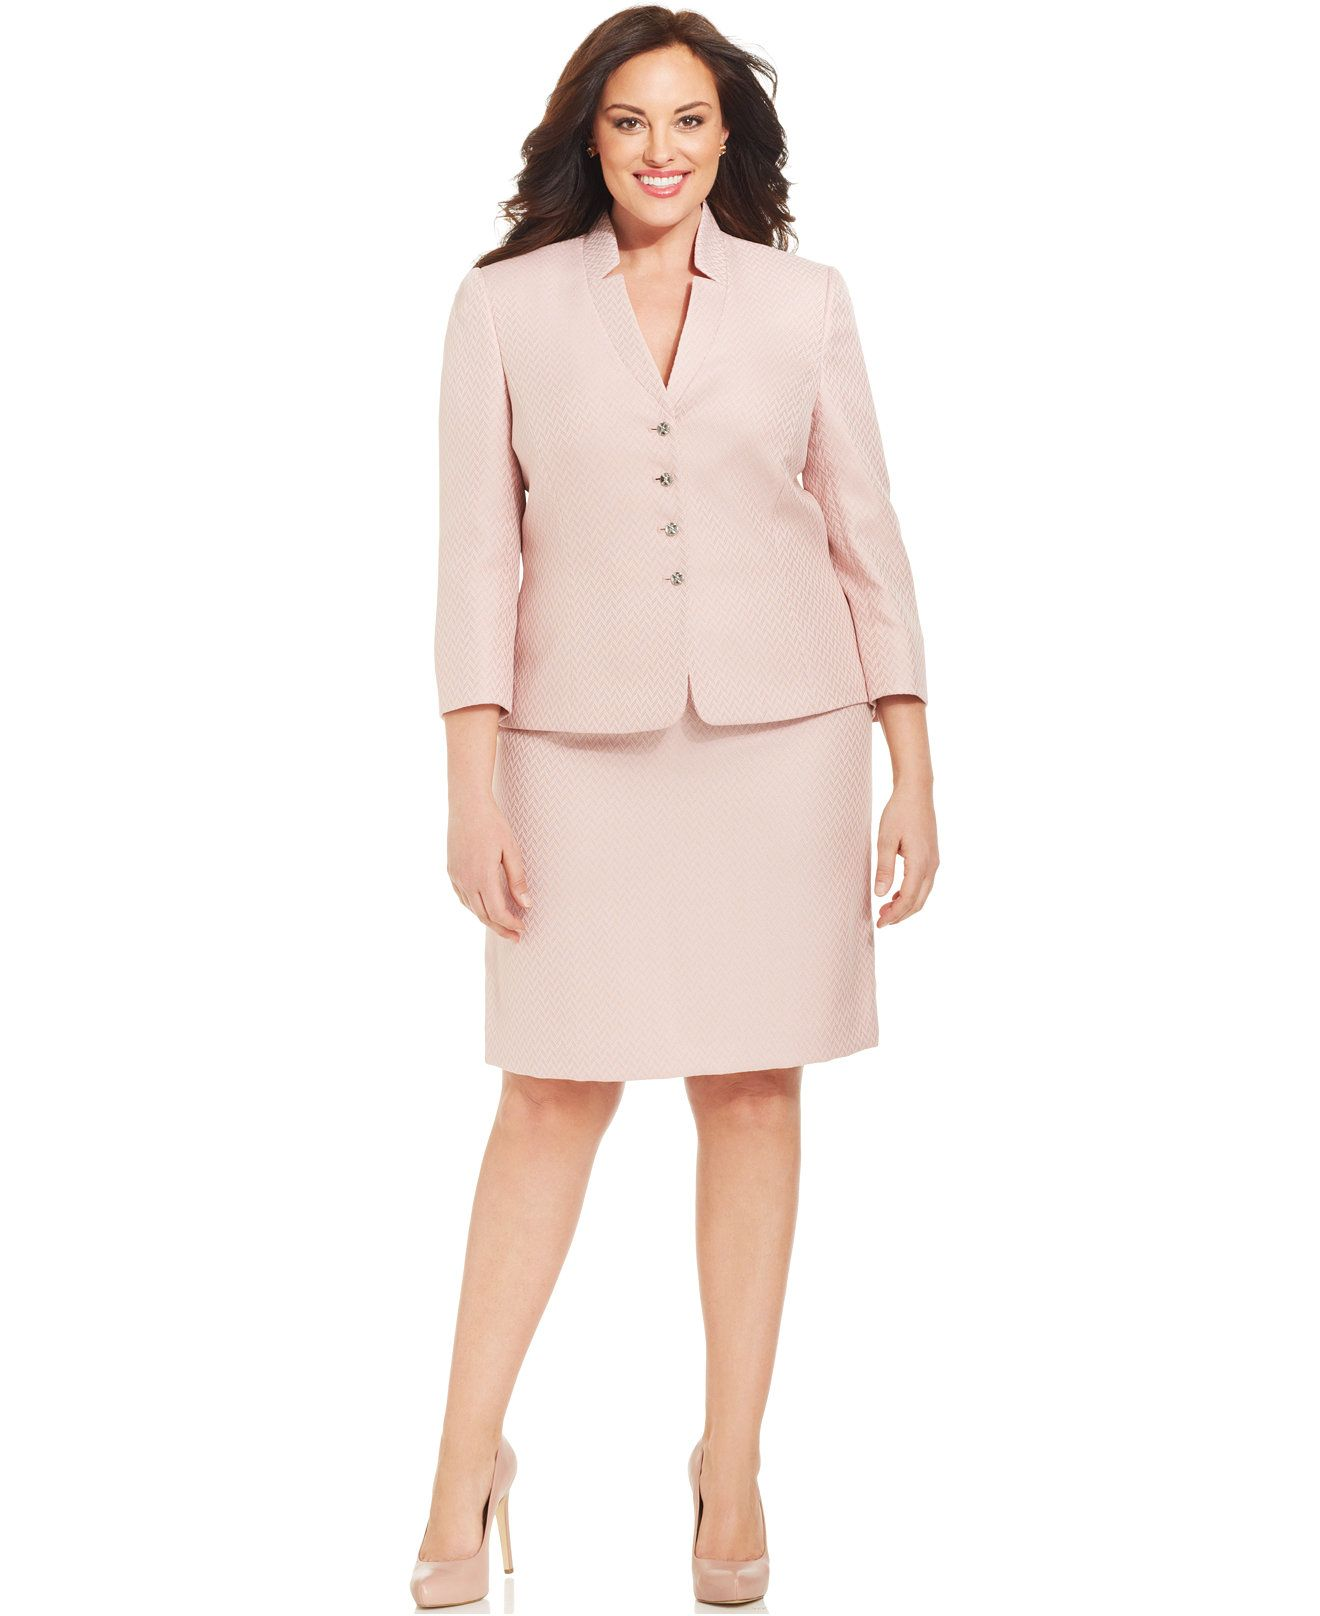 d03dfdc65257 Tahari ASL Plus Size Herringbone Skirt Suit - Shop All Suits   Suit  Separates - Plus Sizes - Macy s